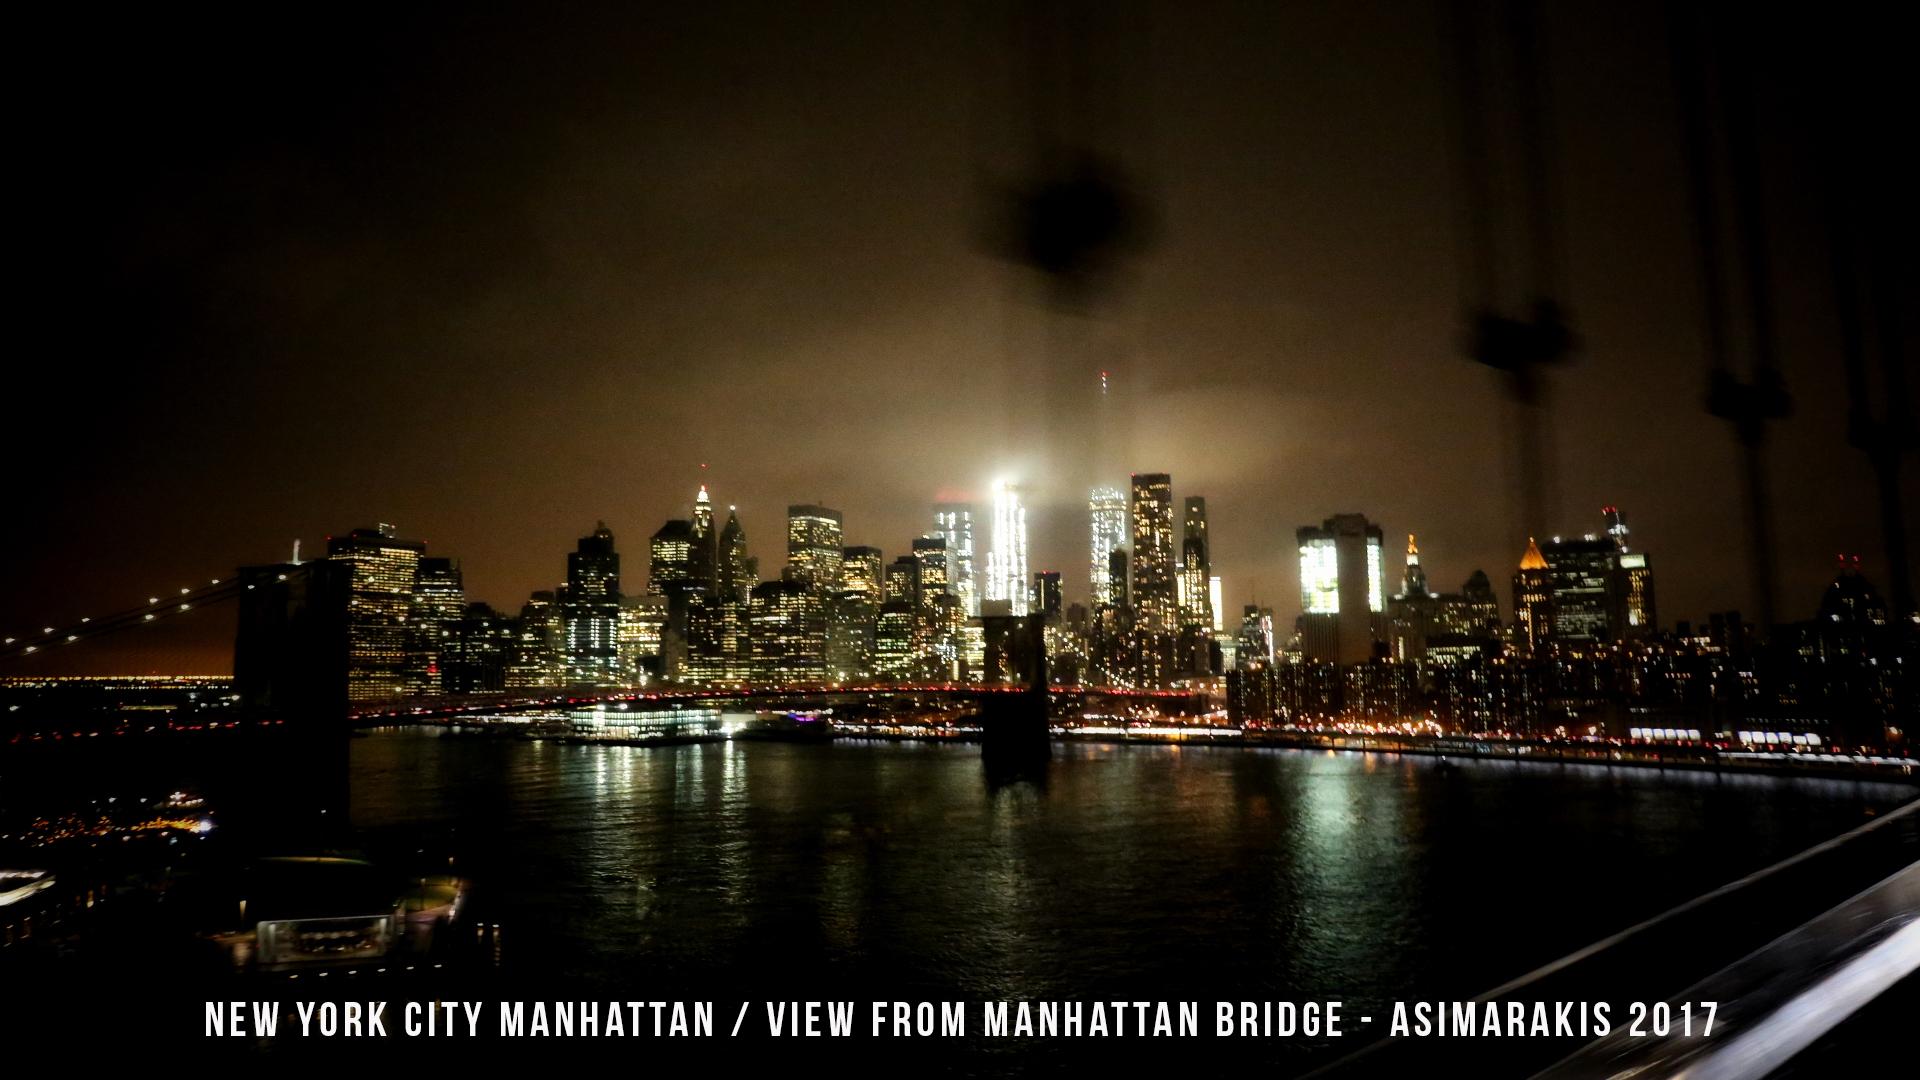 Big Bus Brooklyn Night Tour Photo Shoot, USA